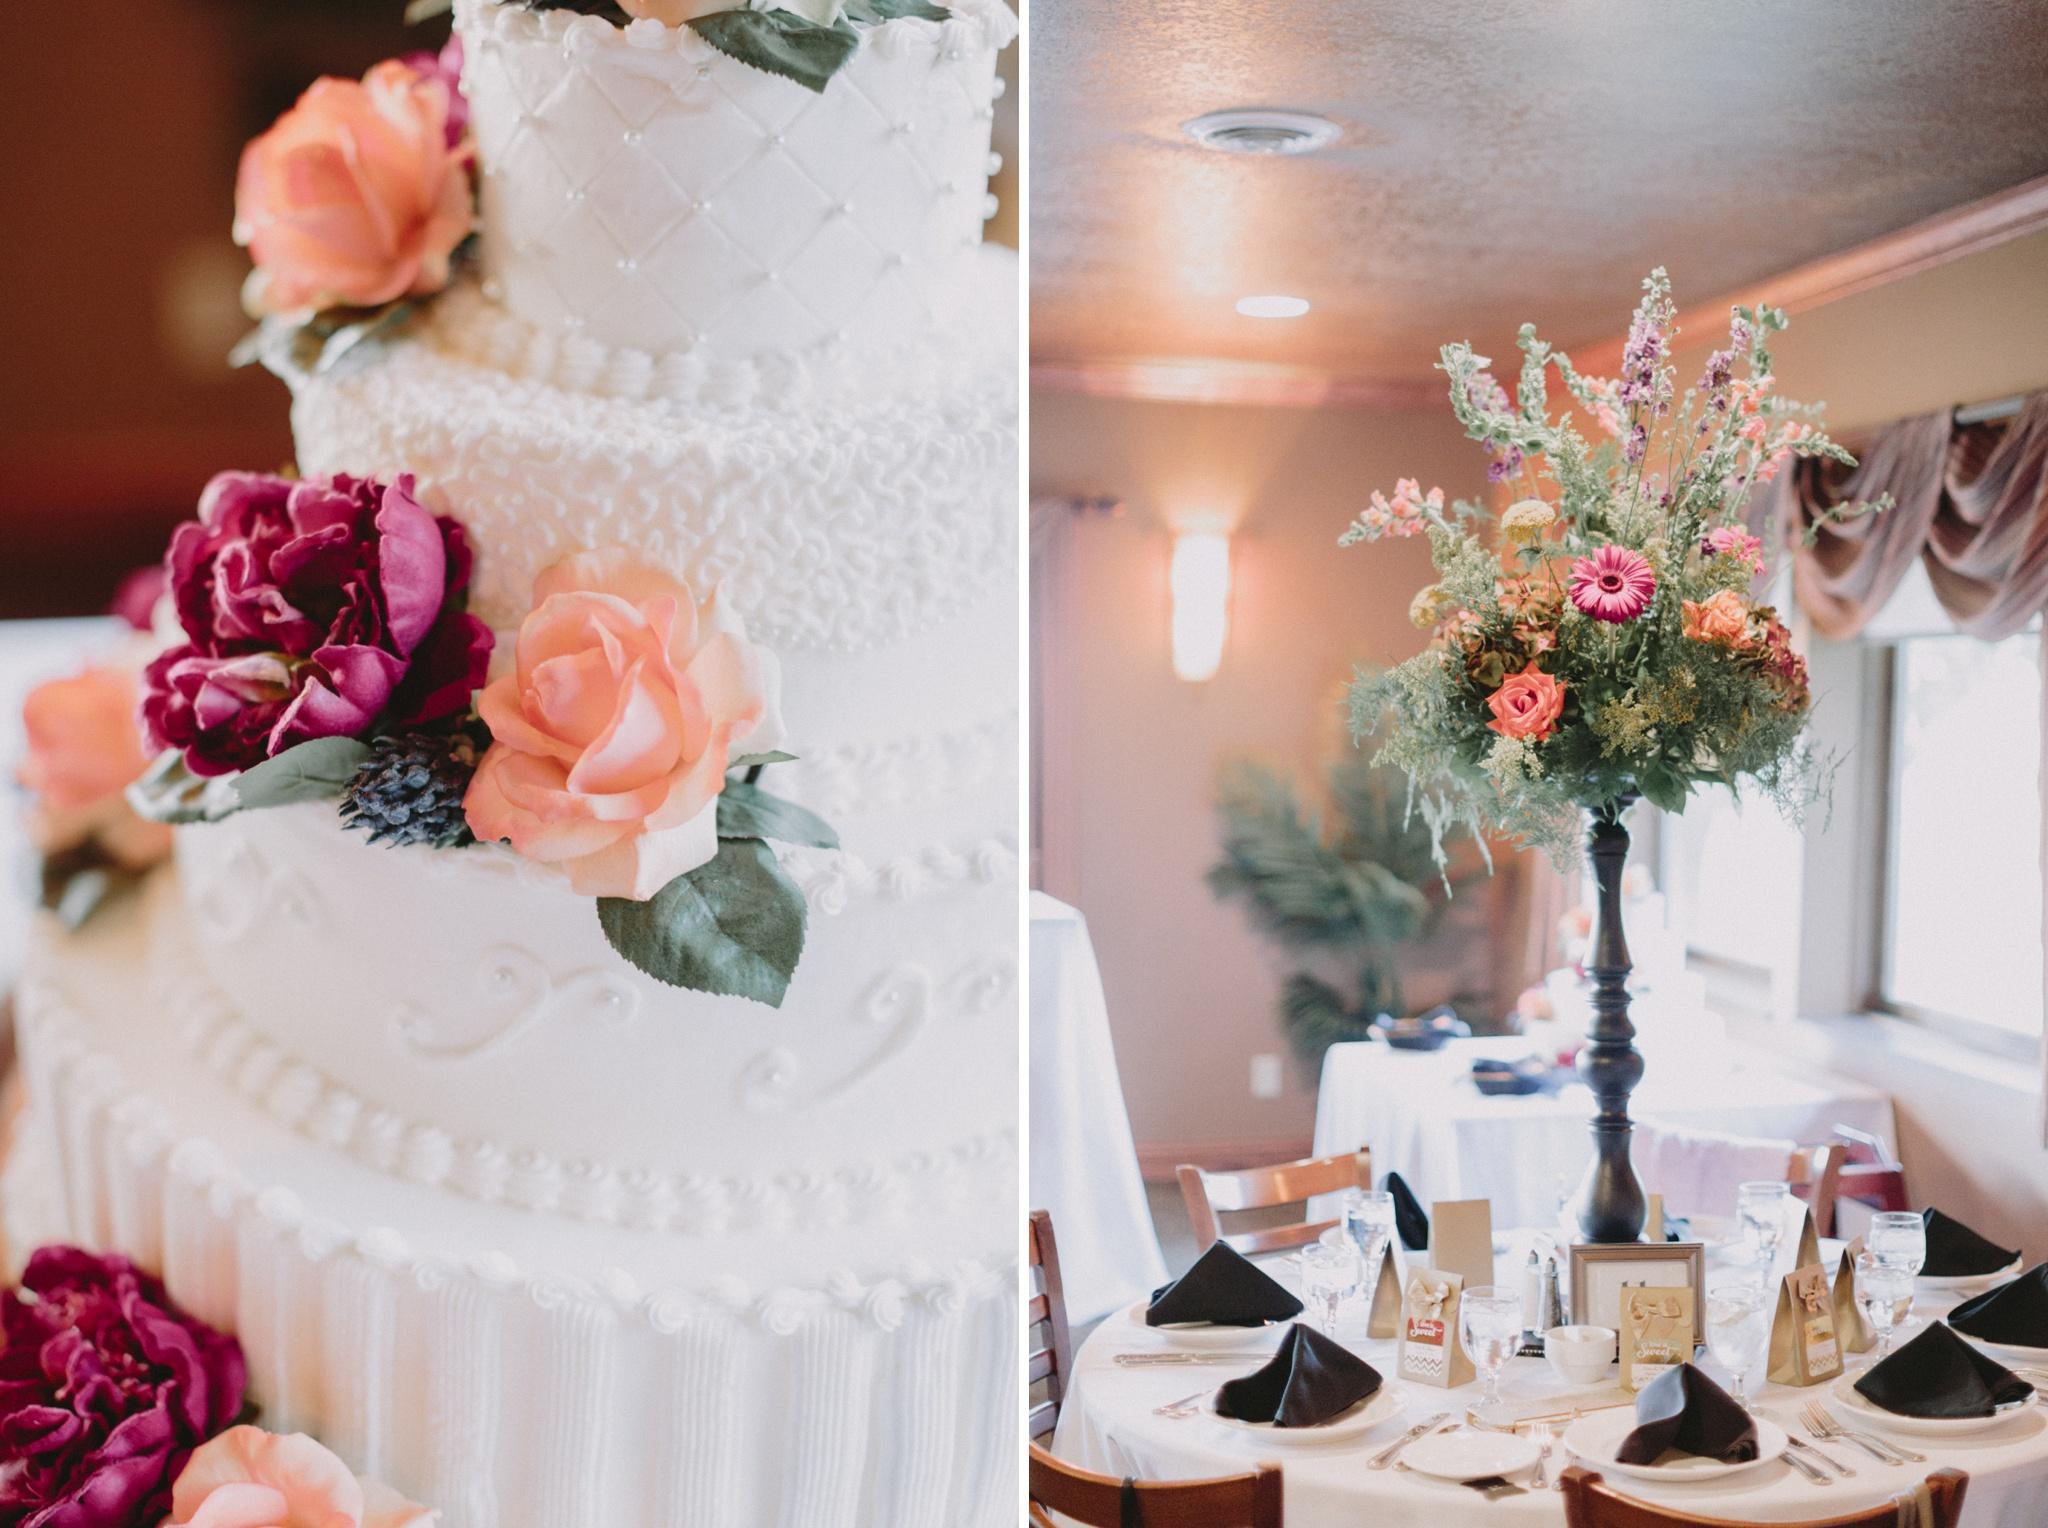 iowa-venue-fort-dodge-willow-ridge-golf-course-decor-purple-pink-flowers